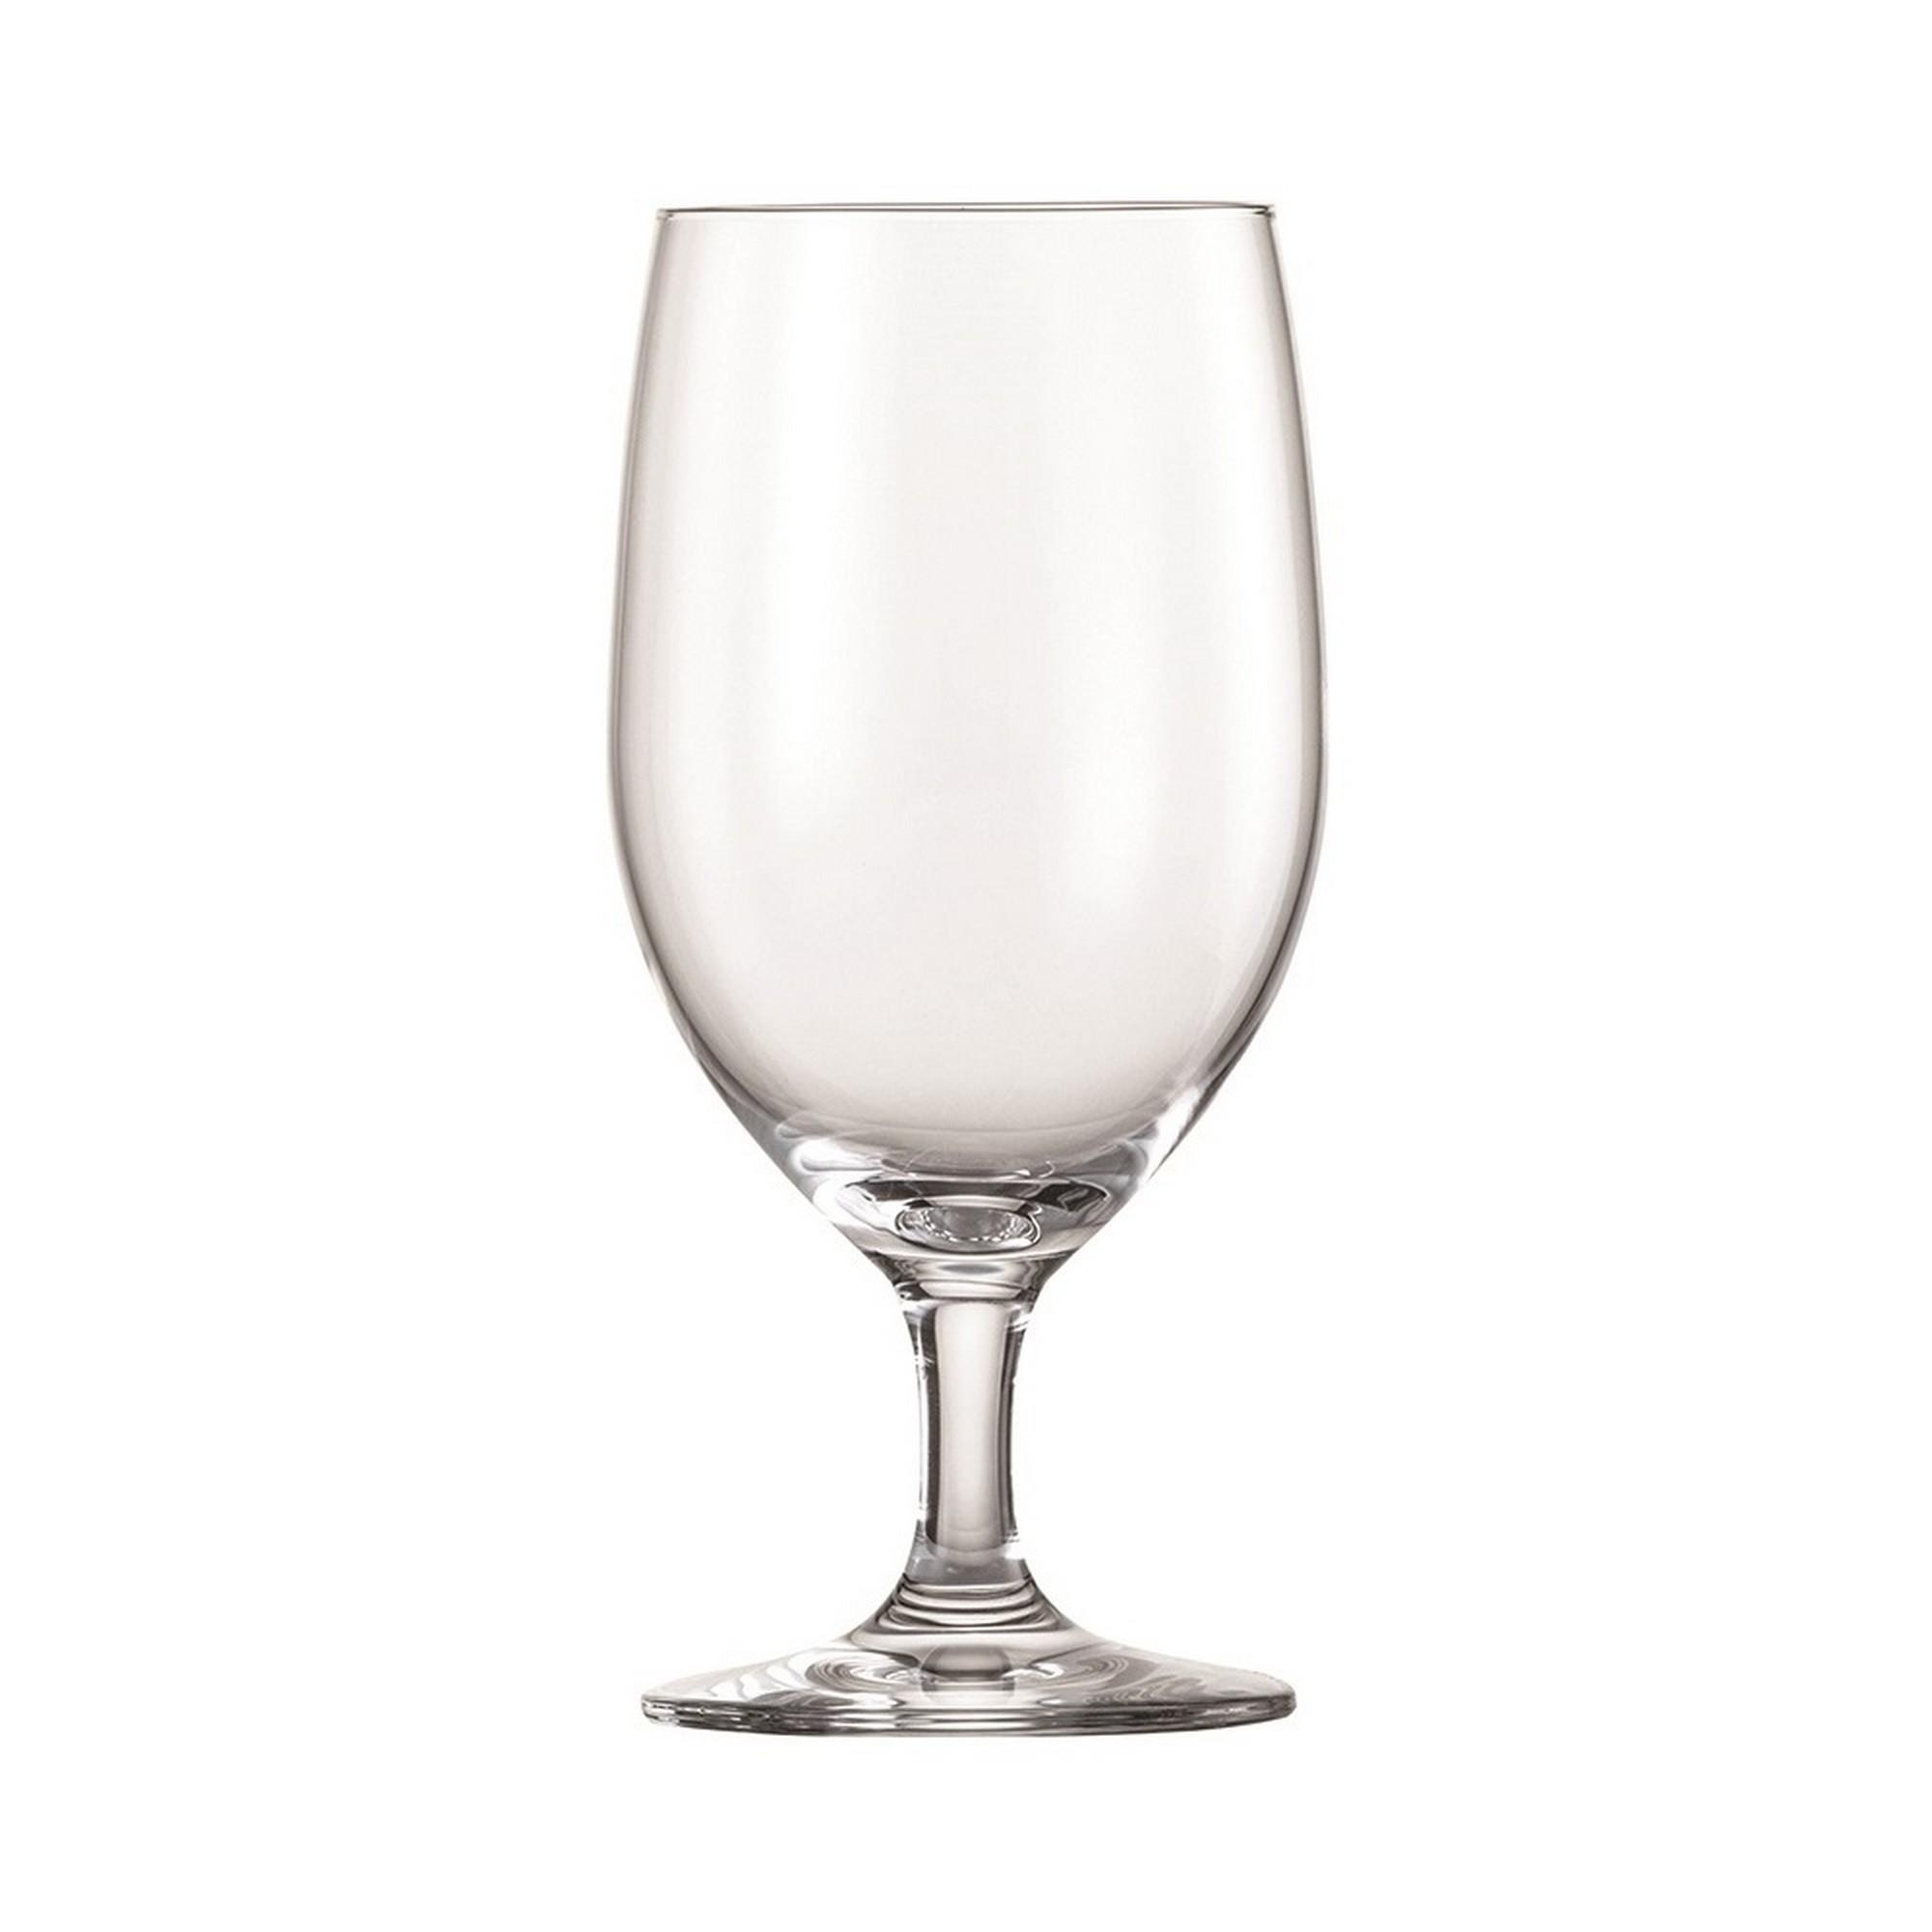 Taça para Água 453ml Schott Zwiesel Viña 6 Peças de Cristal